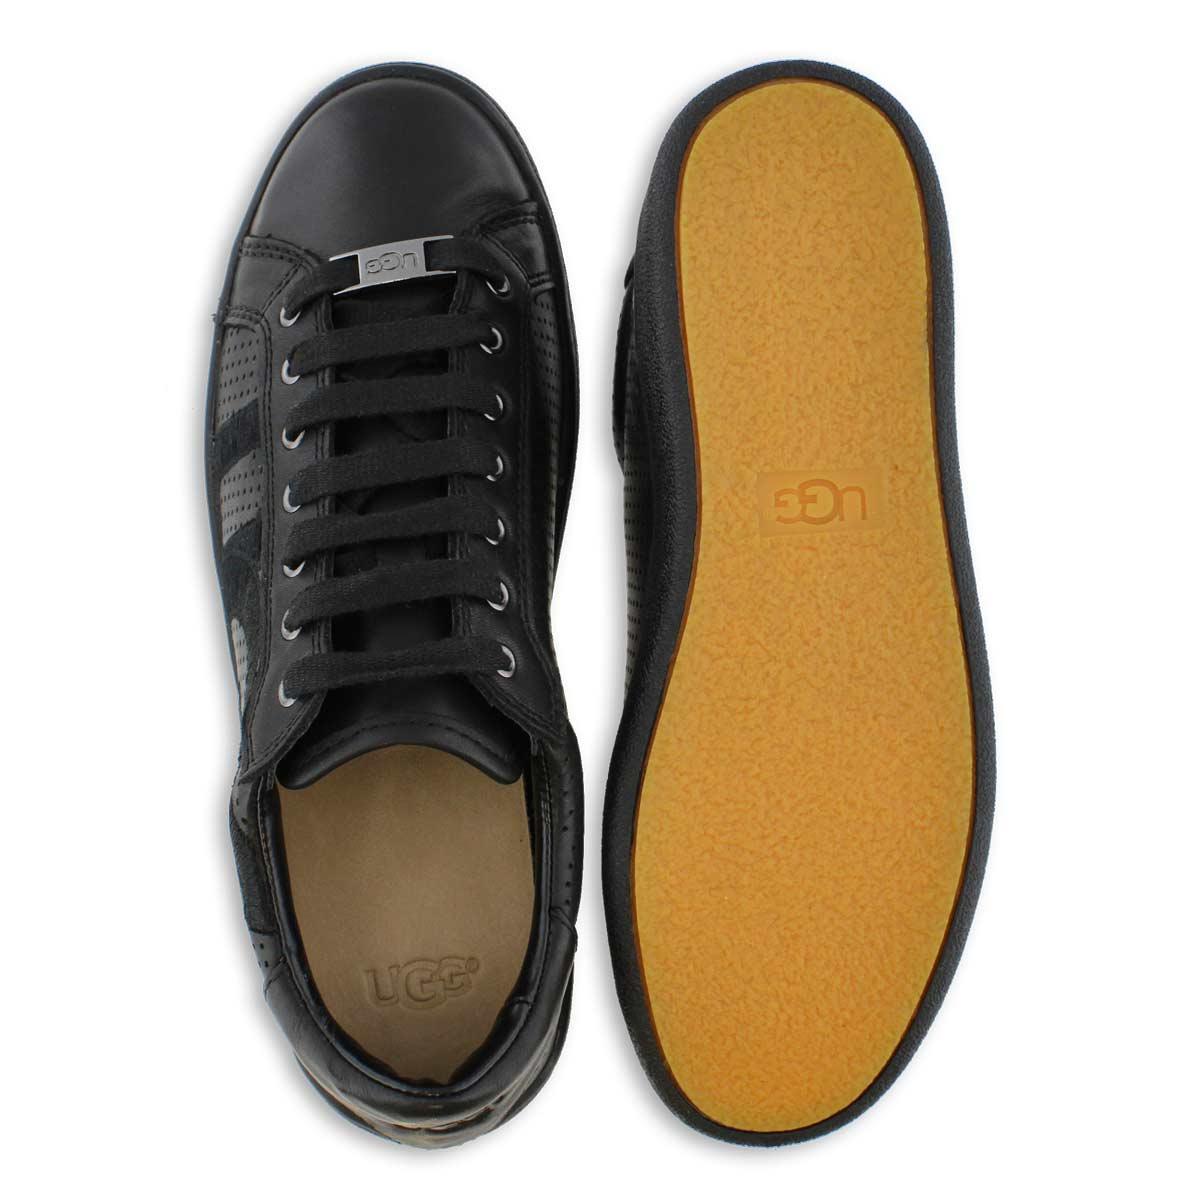 Lds Milo Graphic black casual sneaker